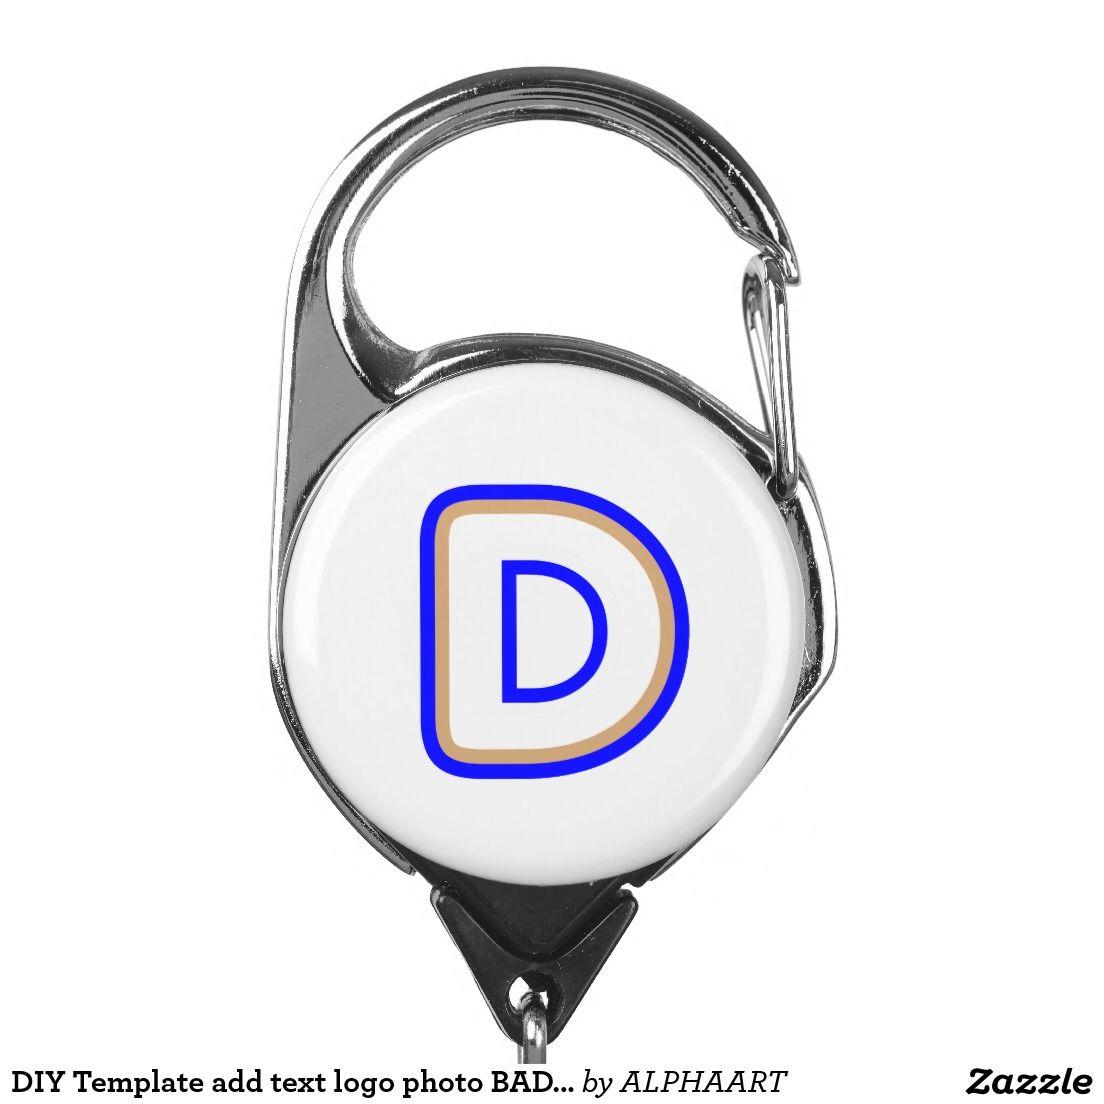 DIY Template add text logo photo BADGE HOLDER+CLIP Badge Holder ...